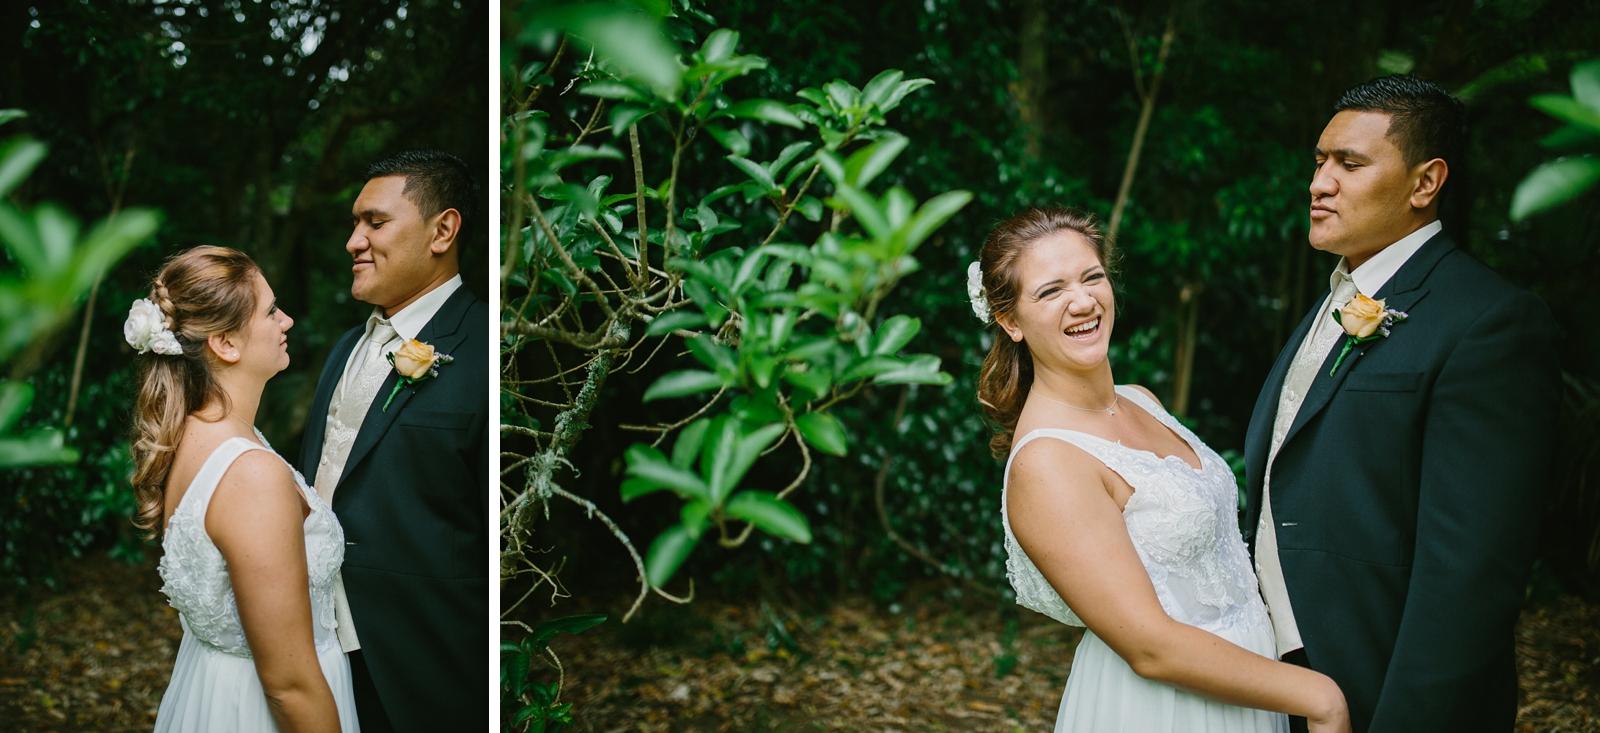 GabbyFiti_Auckland Wedding Photographer_Patty Lagera_0065.jpg